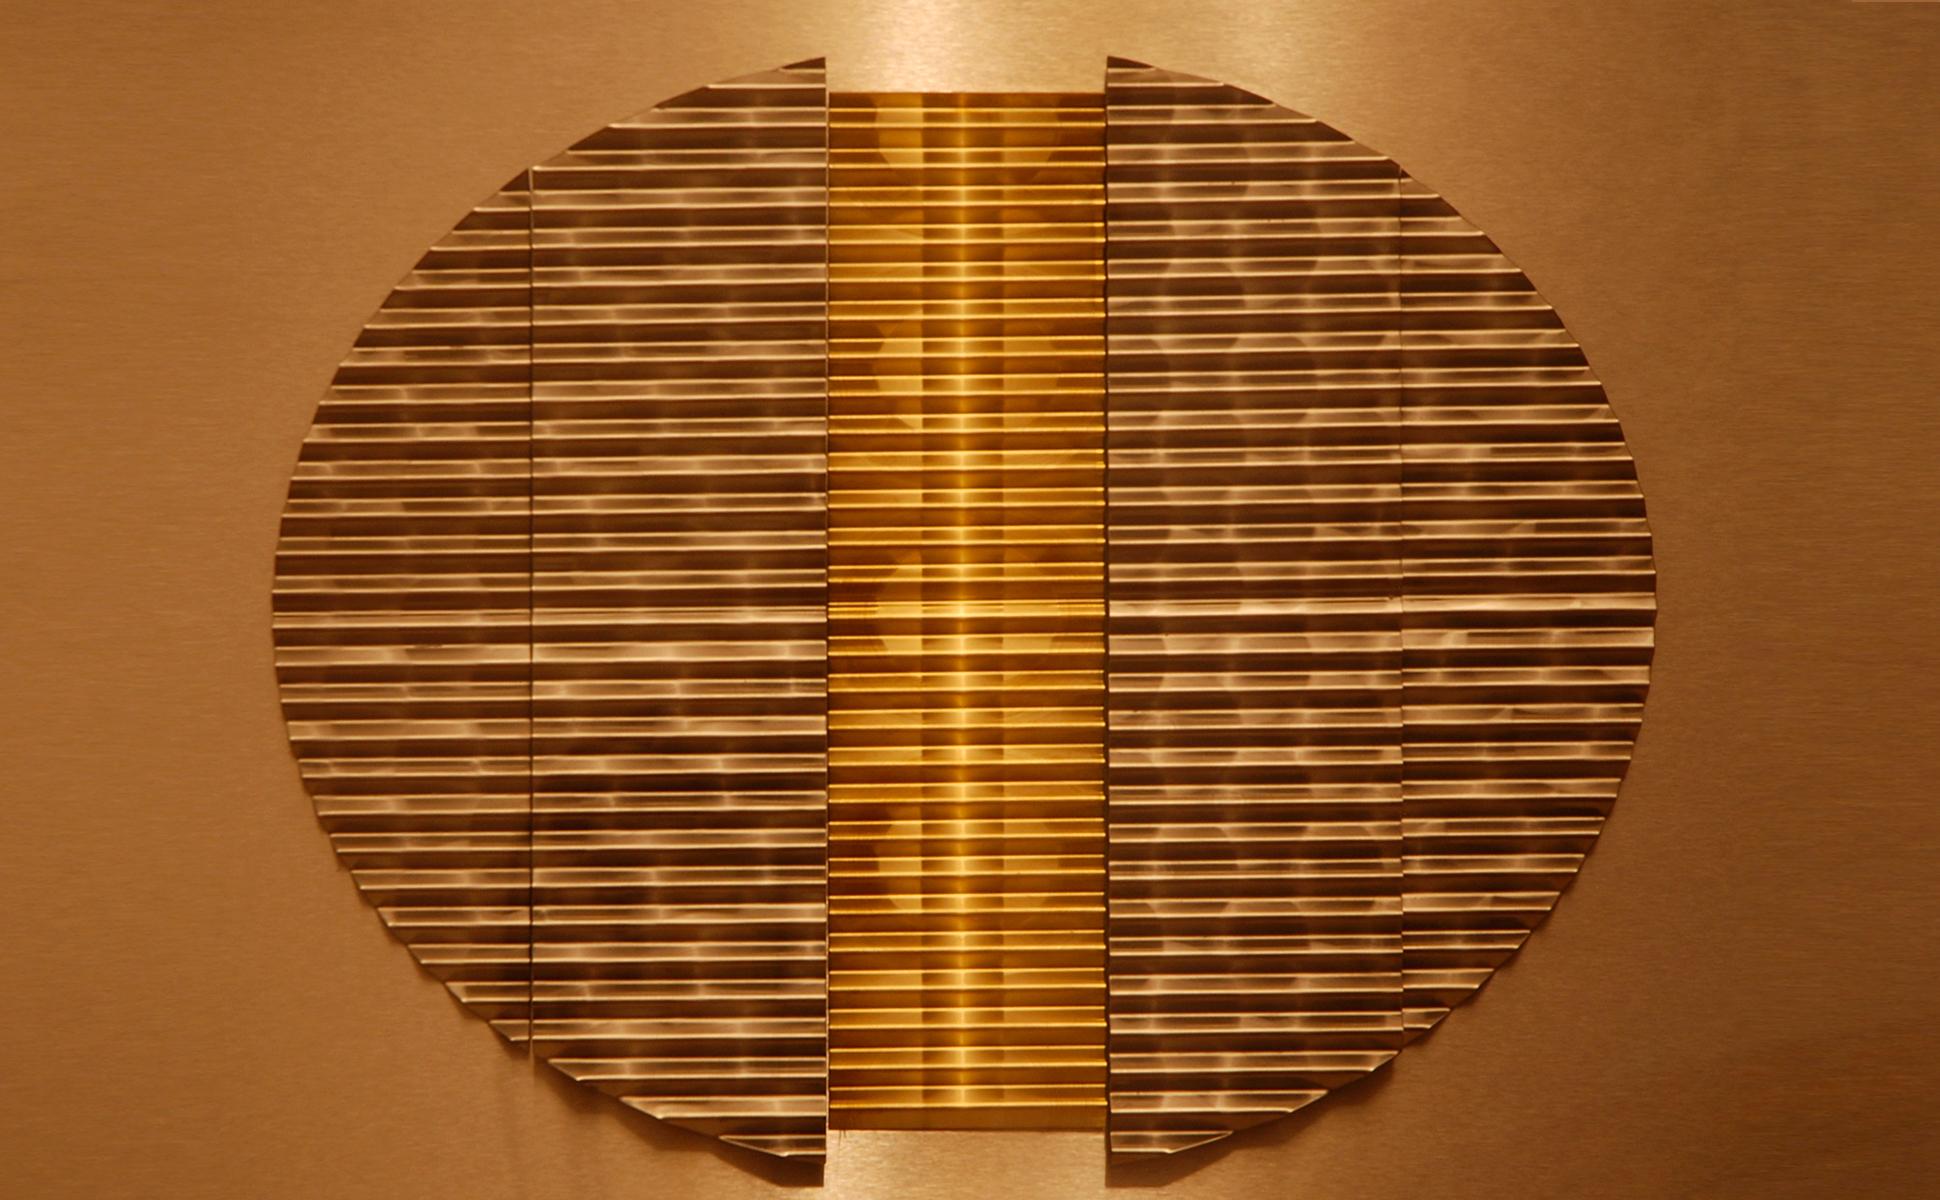 Ivano fabbri modern art